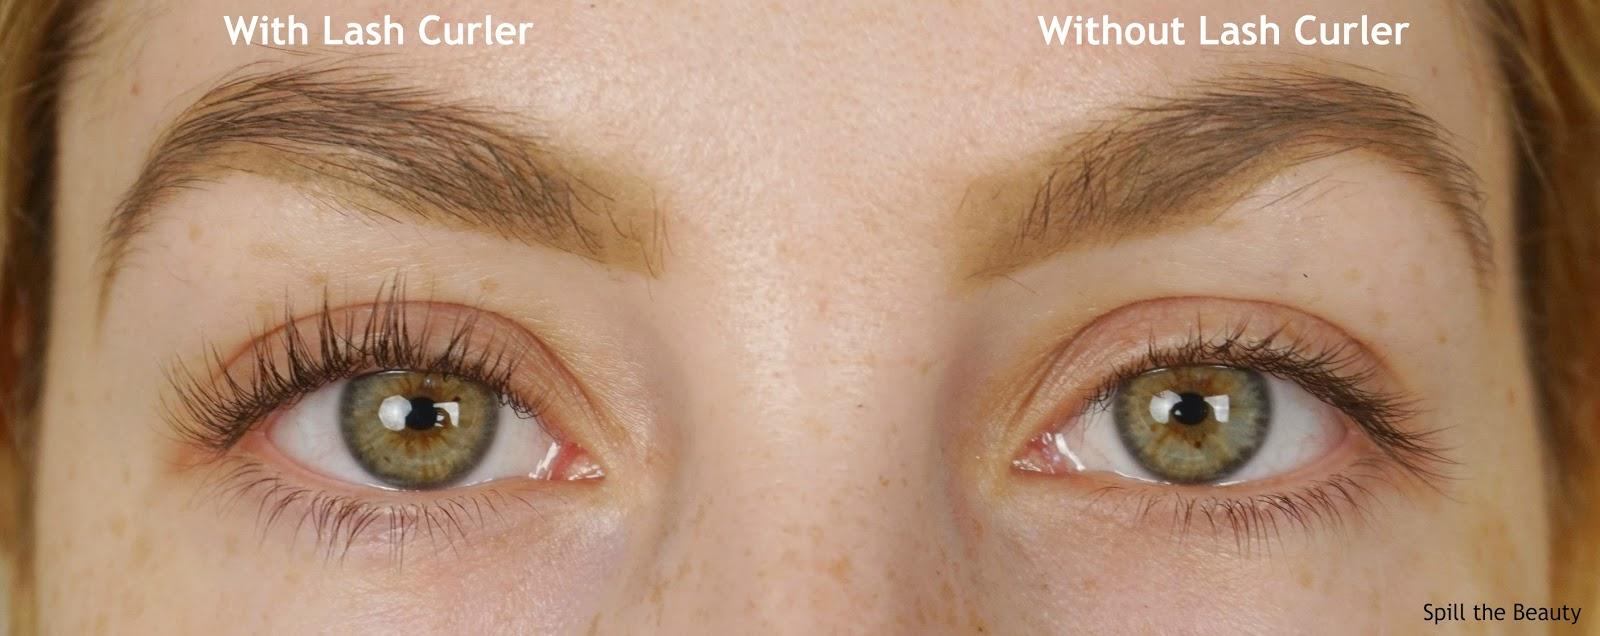 tweezerman rose gold eyelash curler review before and after